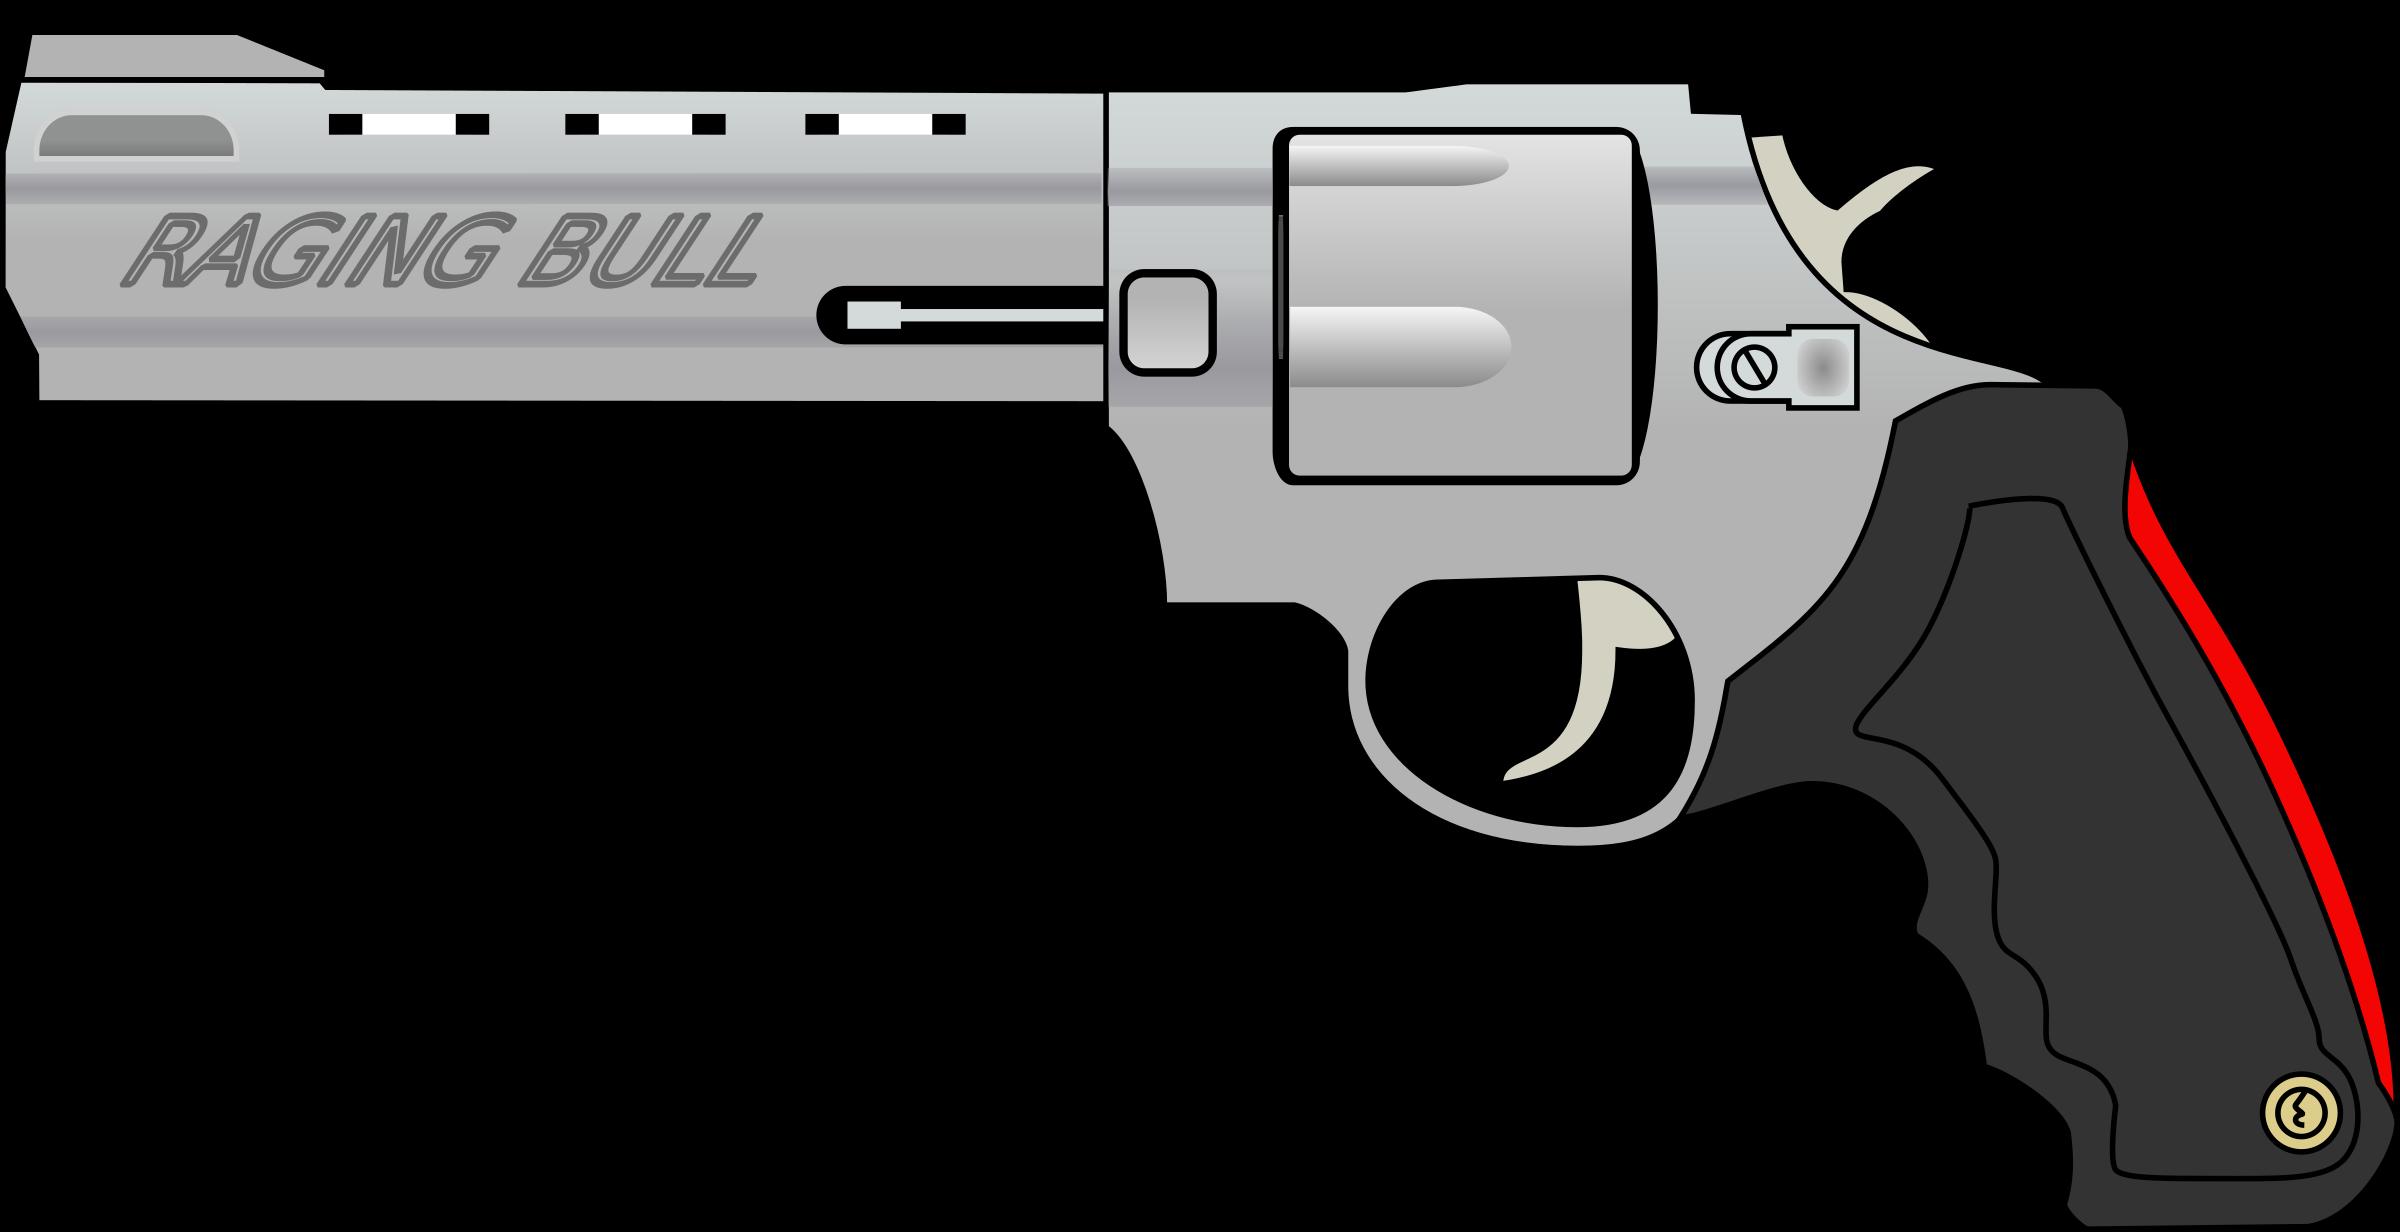 This free Icons Png design of Raging bull - gun PlusPng.com  - Cartoon Gun PNG